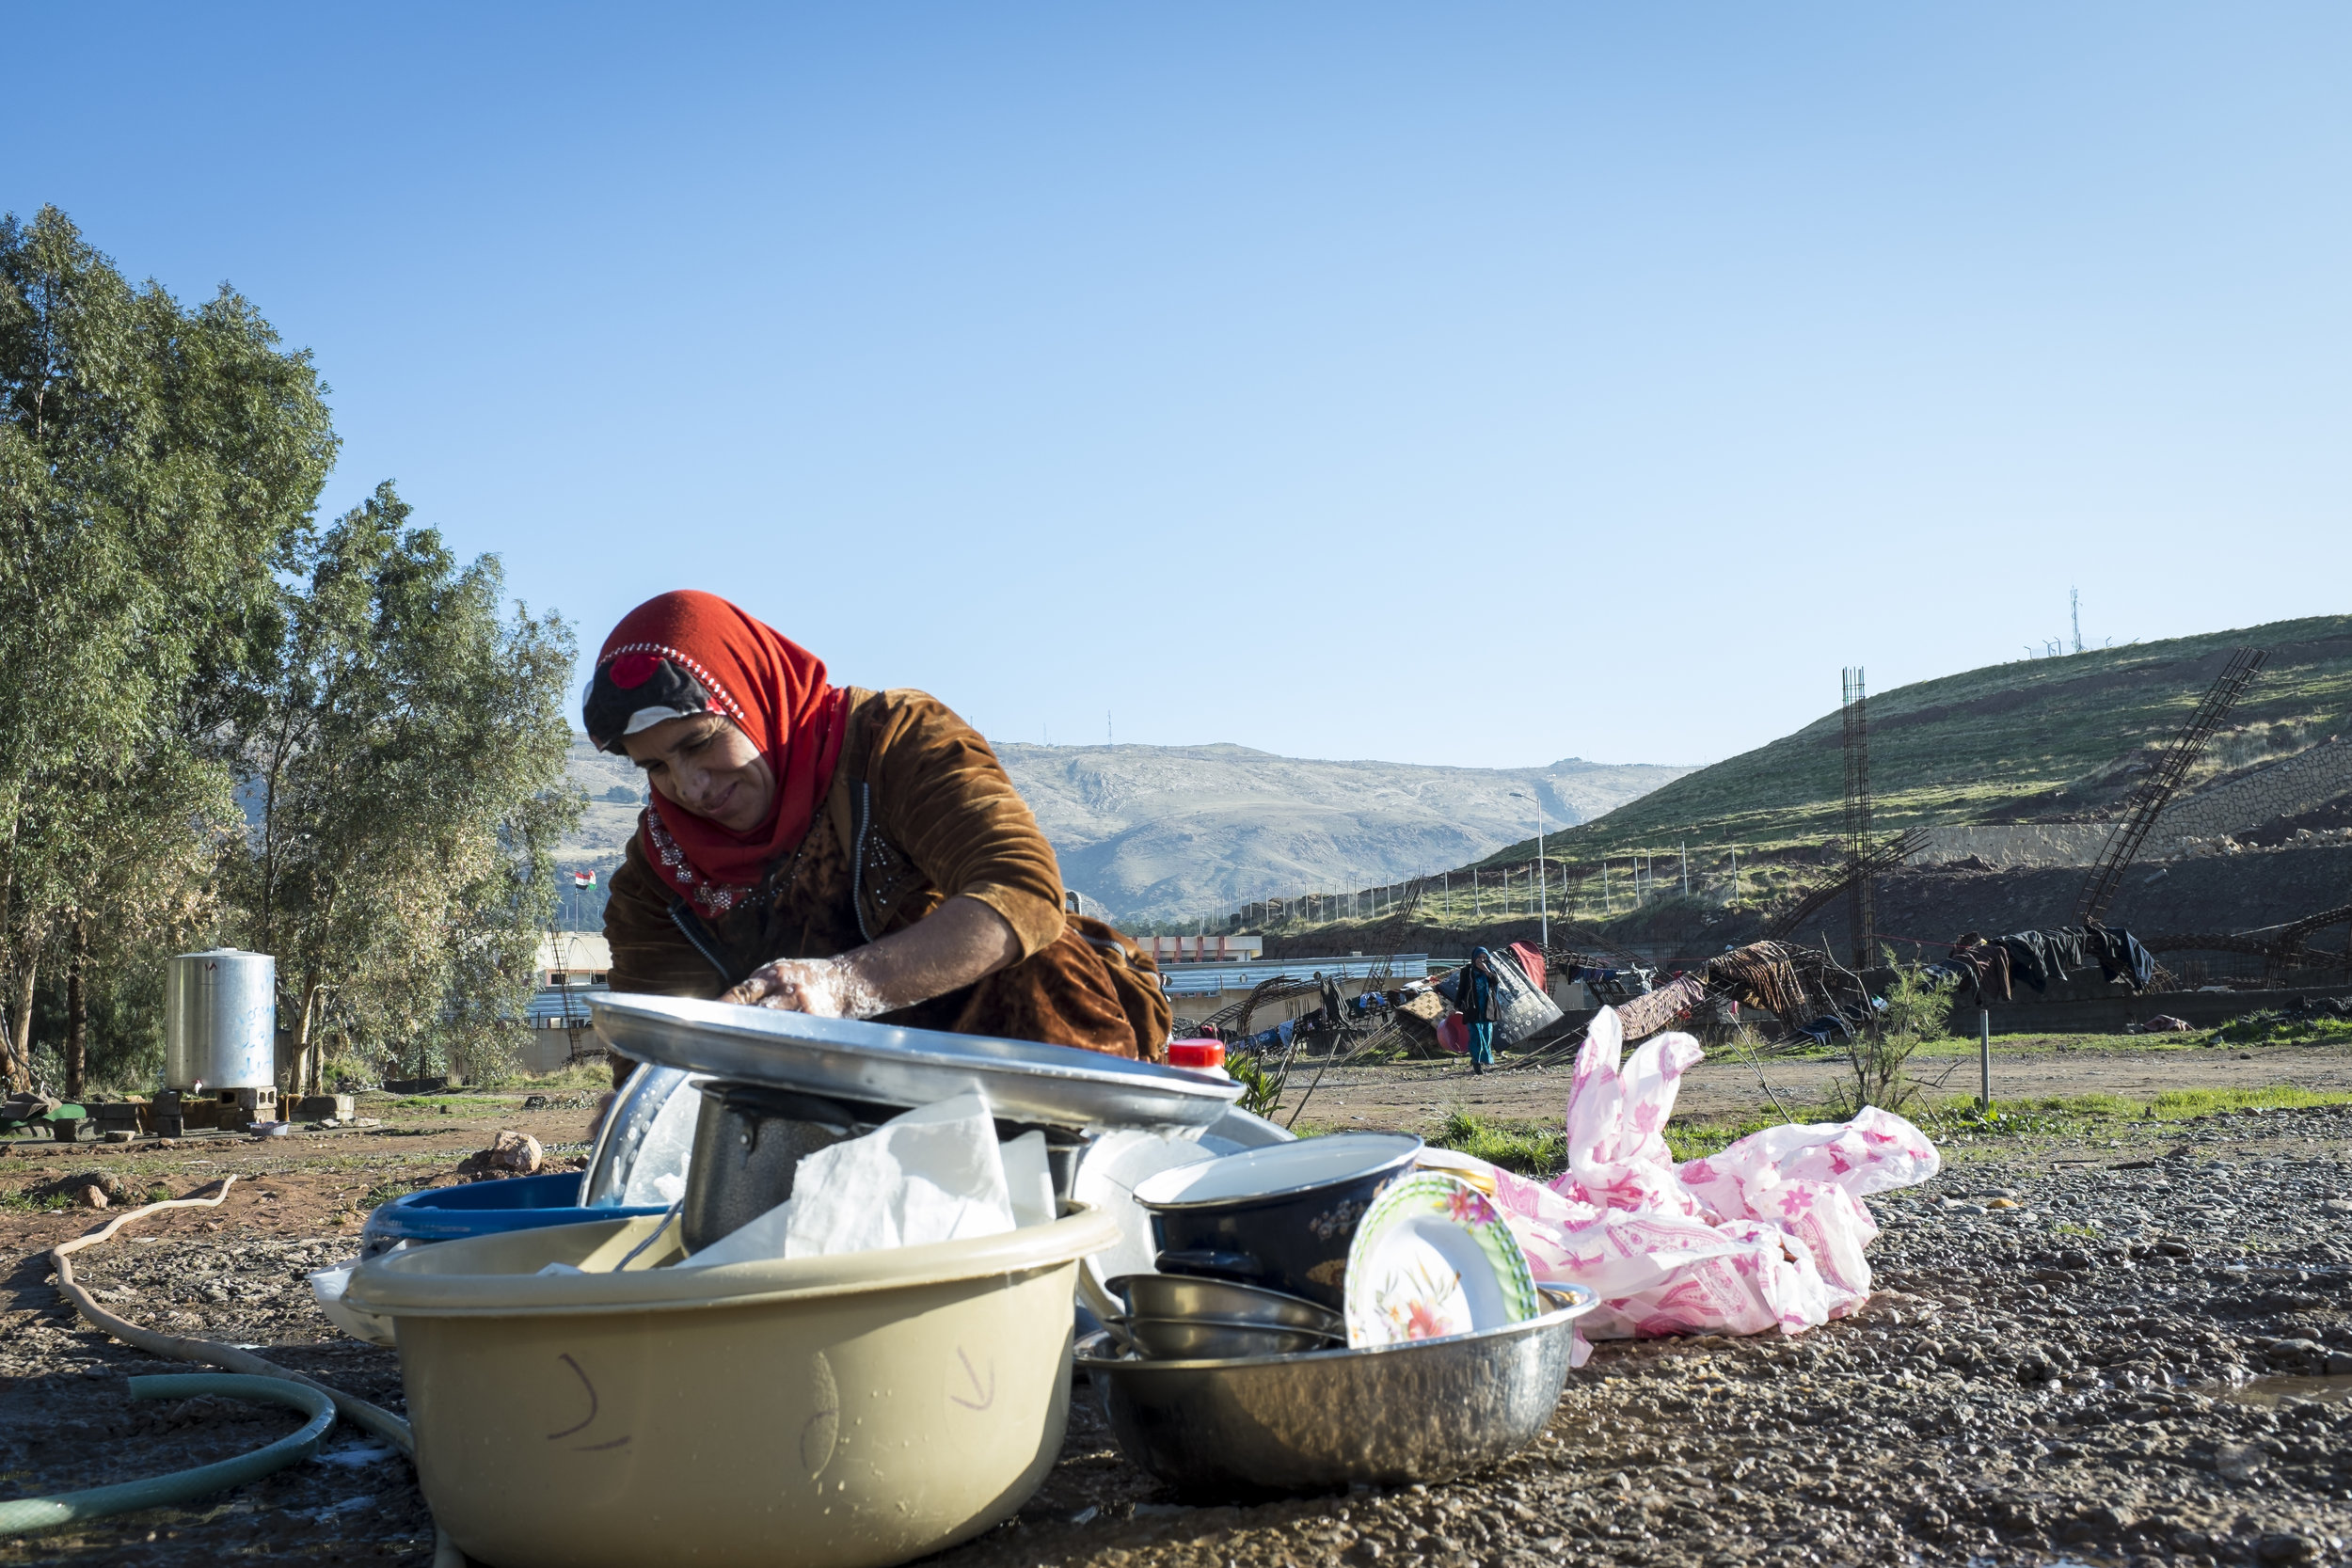 20141204_Refugees_GH_0204.jpg